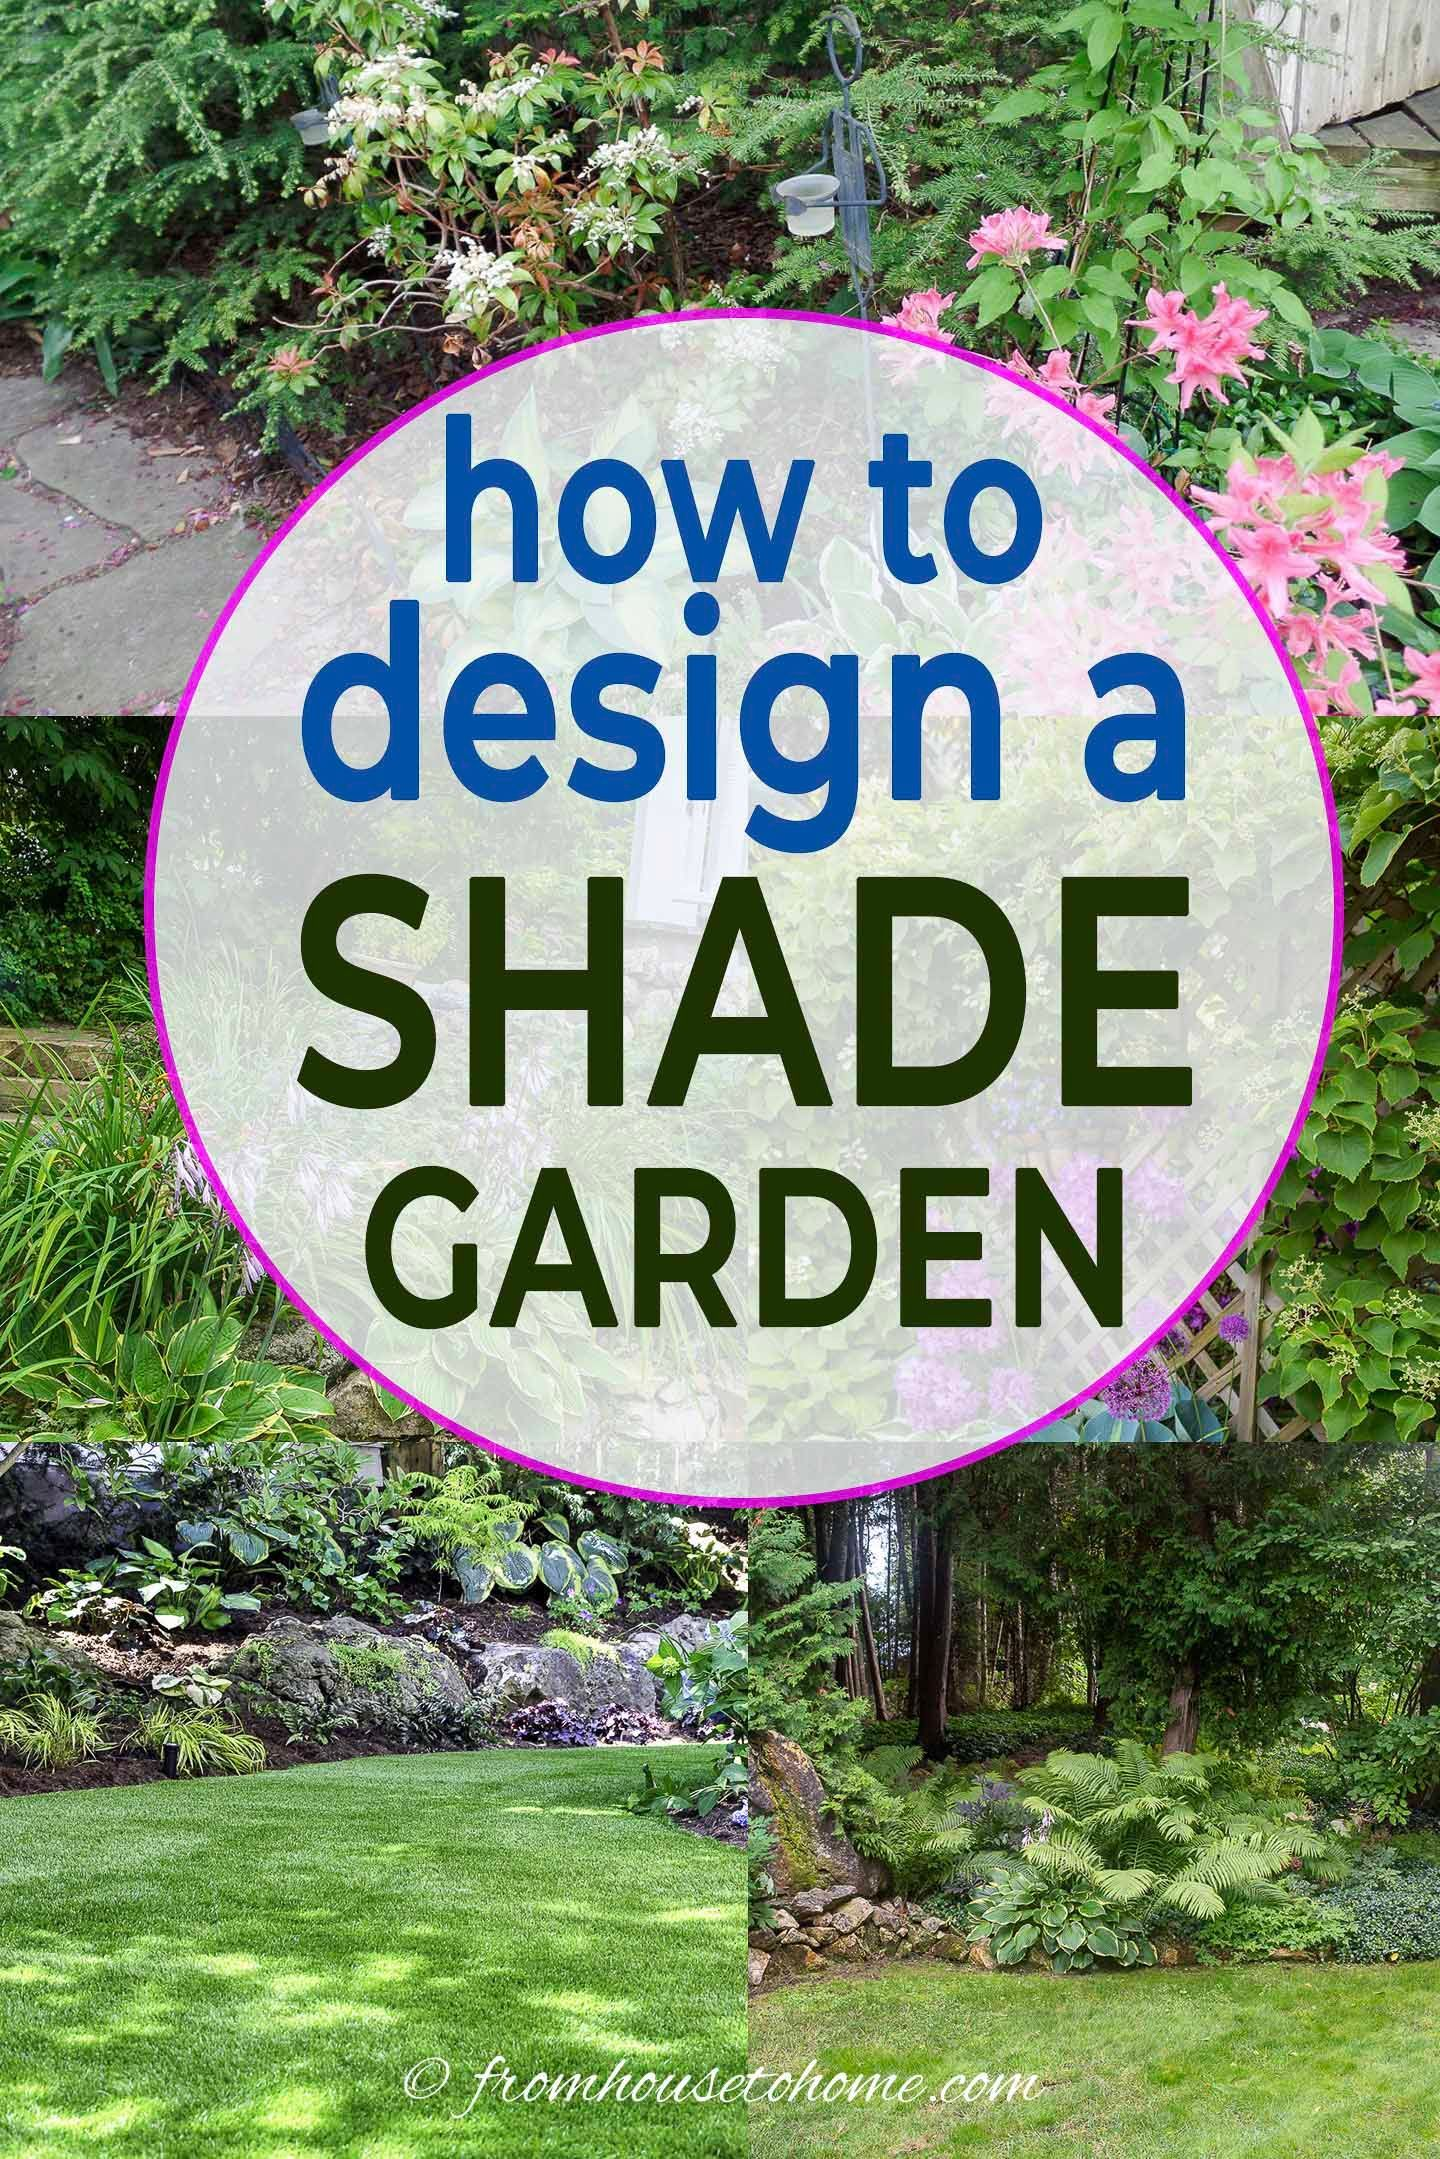 Shade Garden Design Ideas How To Design A Stunning Shade Garden With Pictures Gardening From House To Home Shade Garden Design Shade Garden Shade Garden Plants